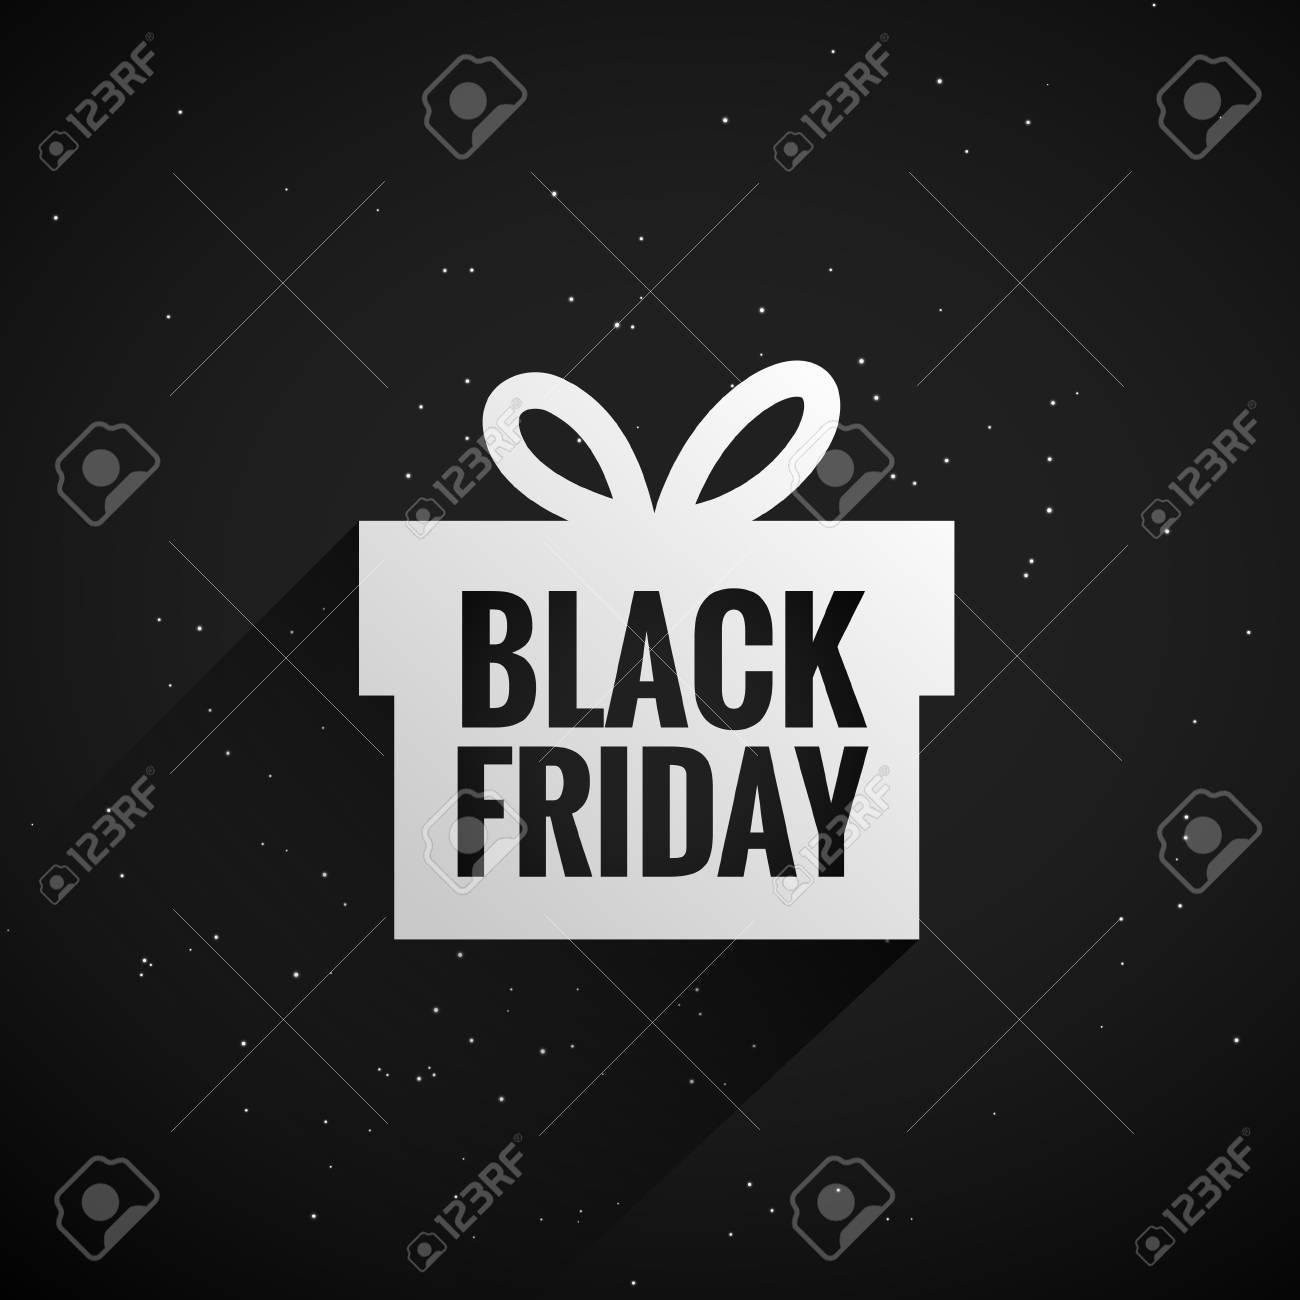 black friday gift box - 60197852